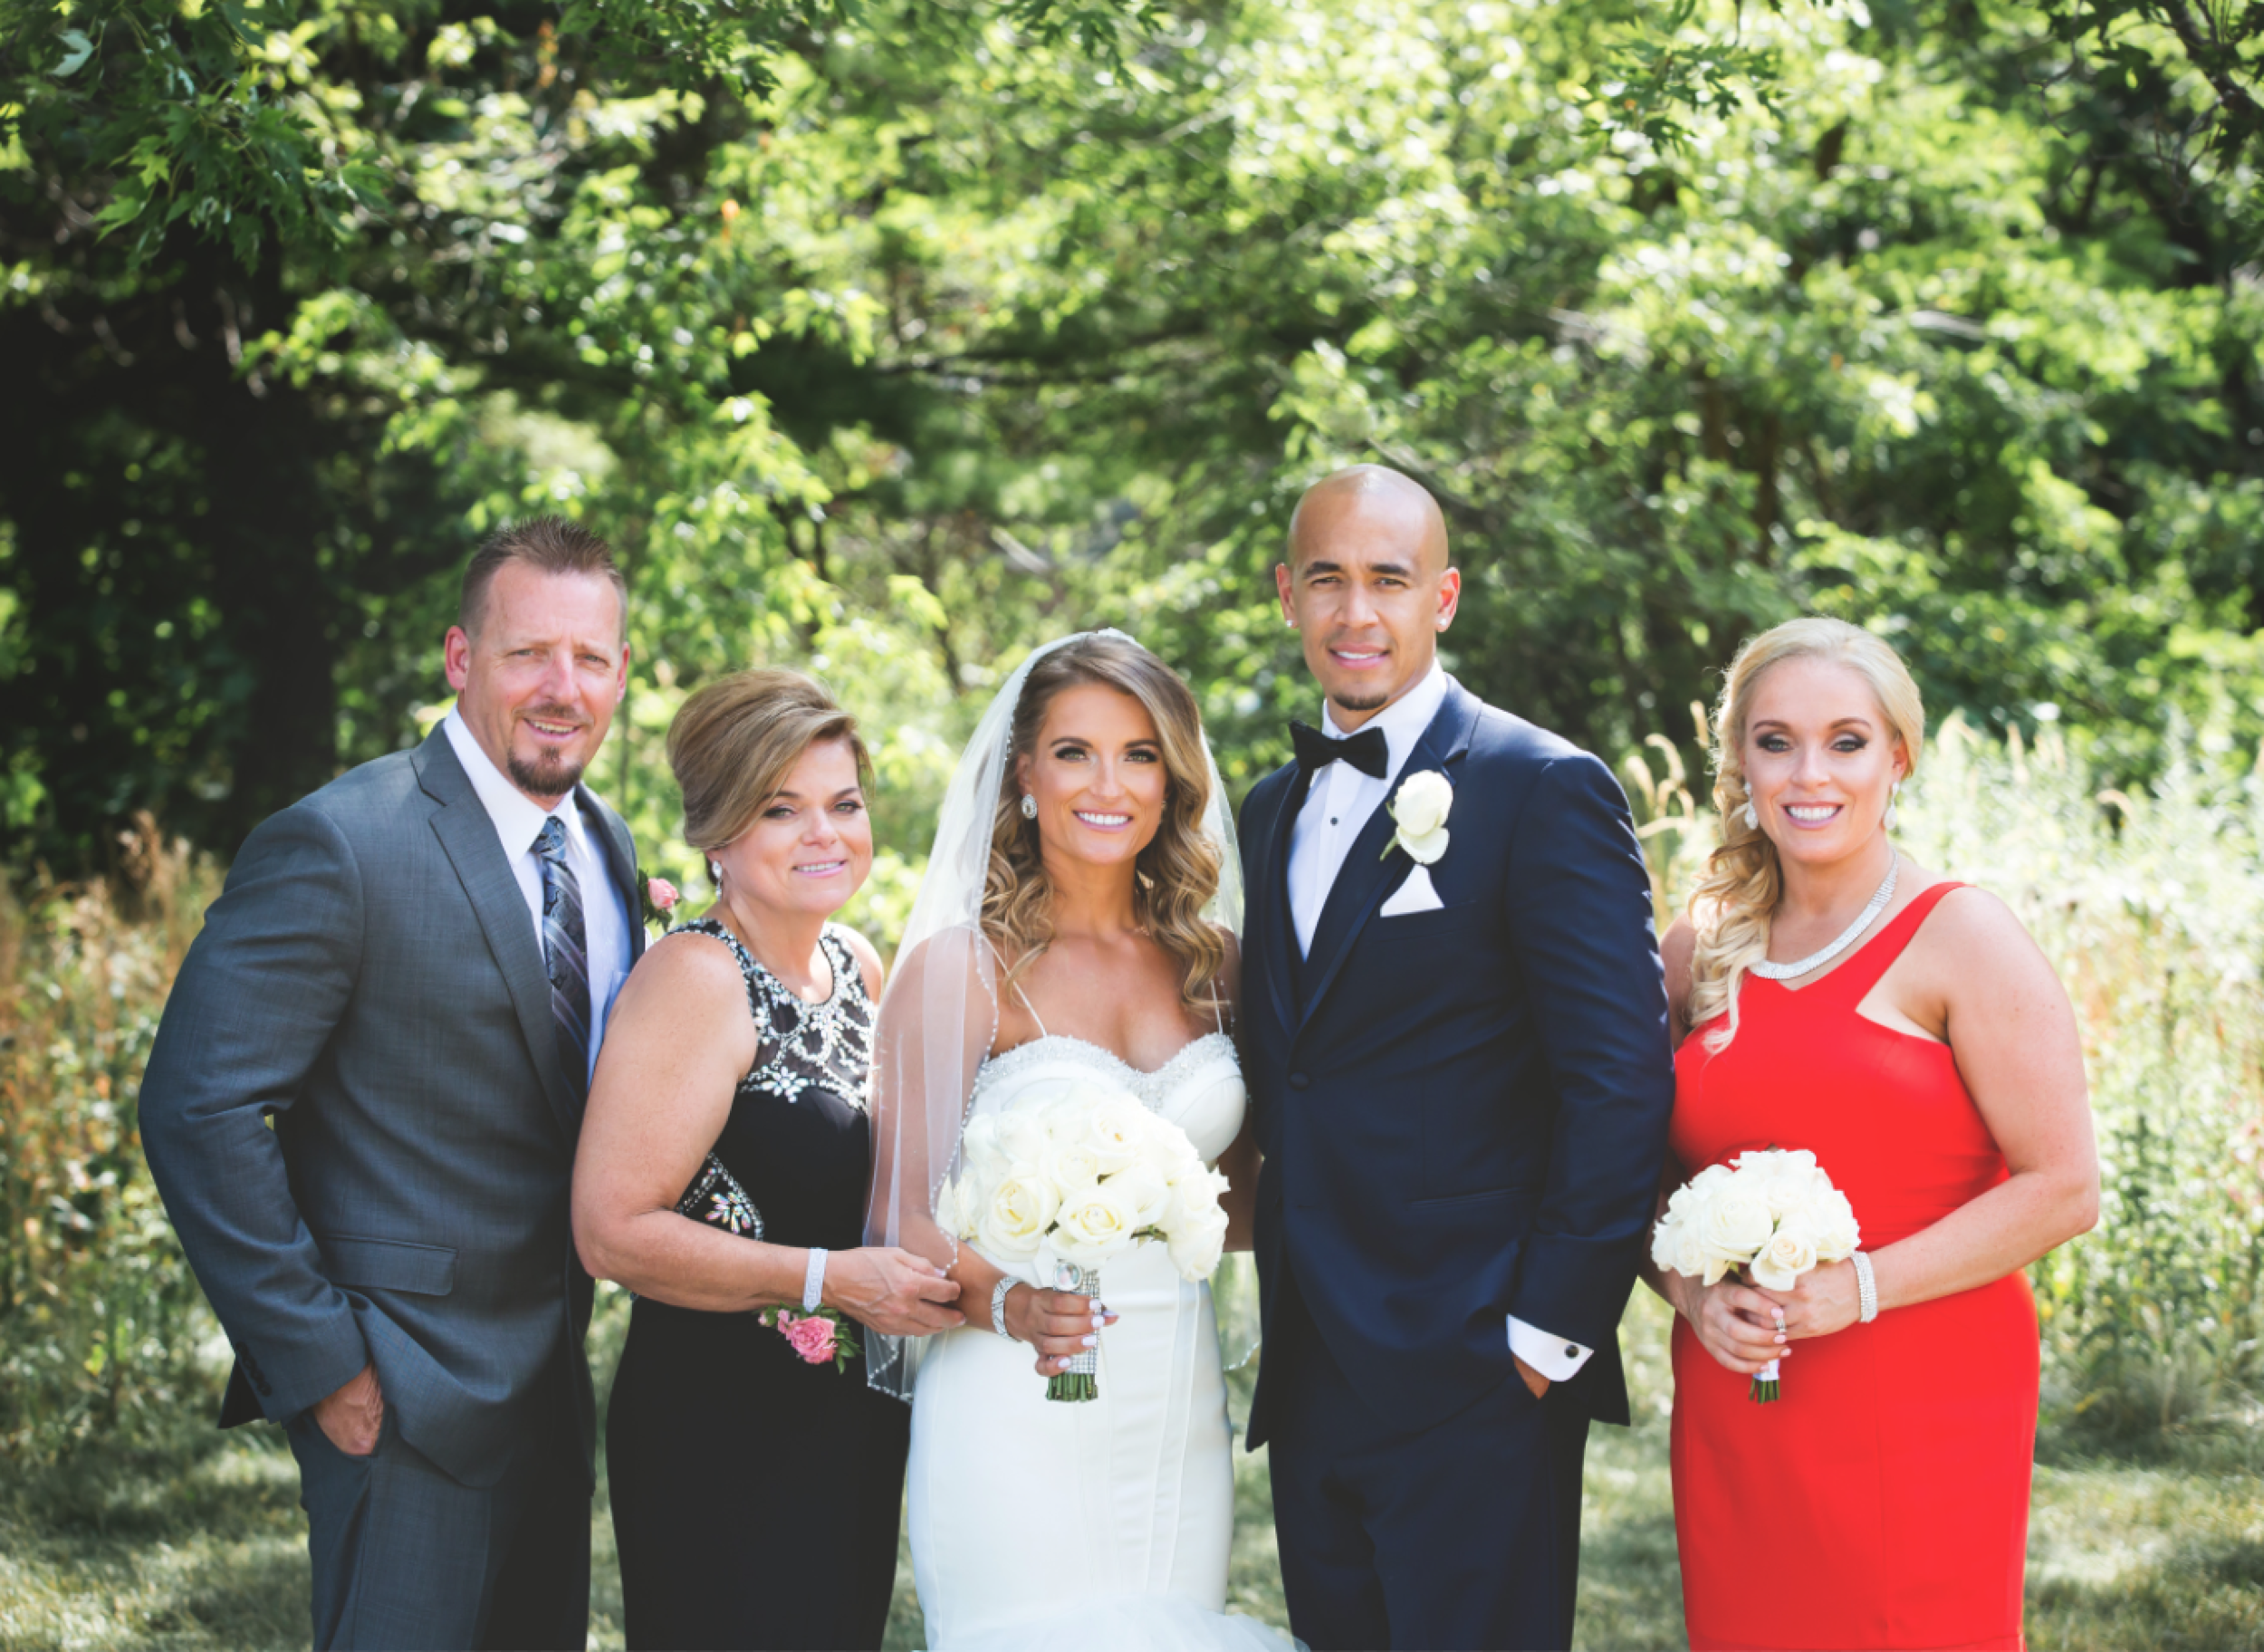 Wedding-Burlington-Convention-Center-Burlington-Oakville-Toronto-Hamilton-Niagara-Wedding-Photographer-Photography-Moments-by-Lauren-Photo-Image-28.png